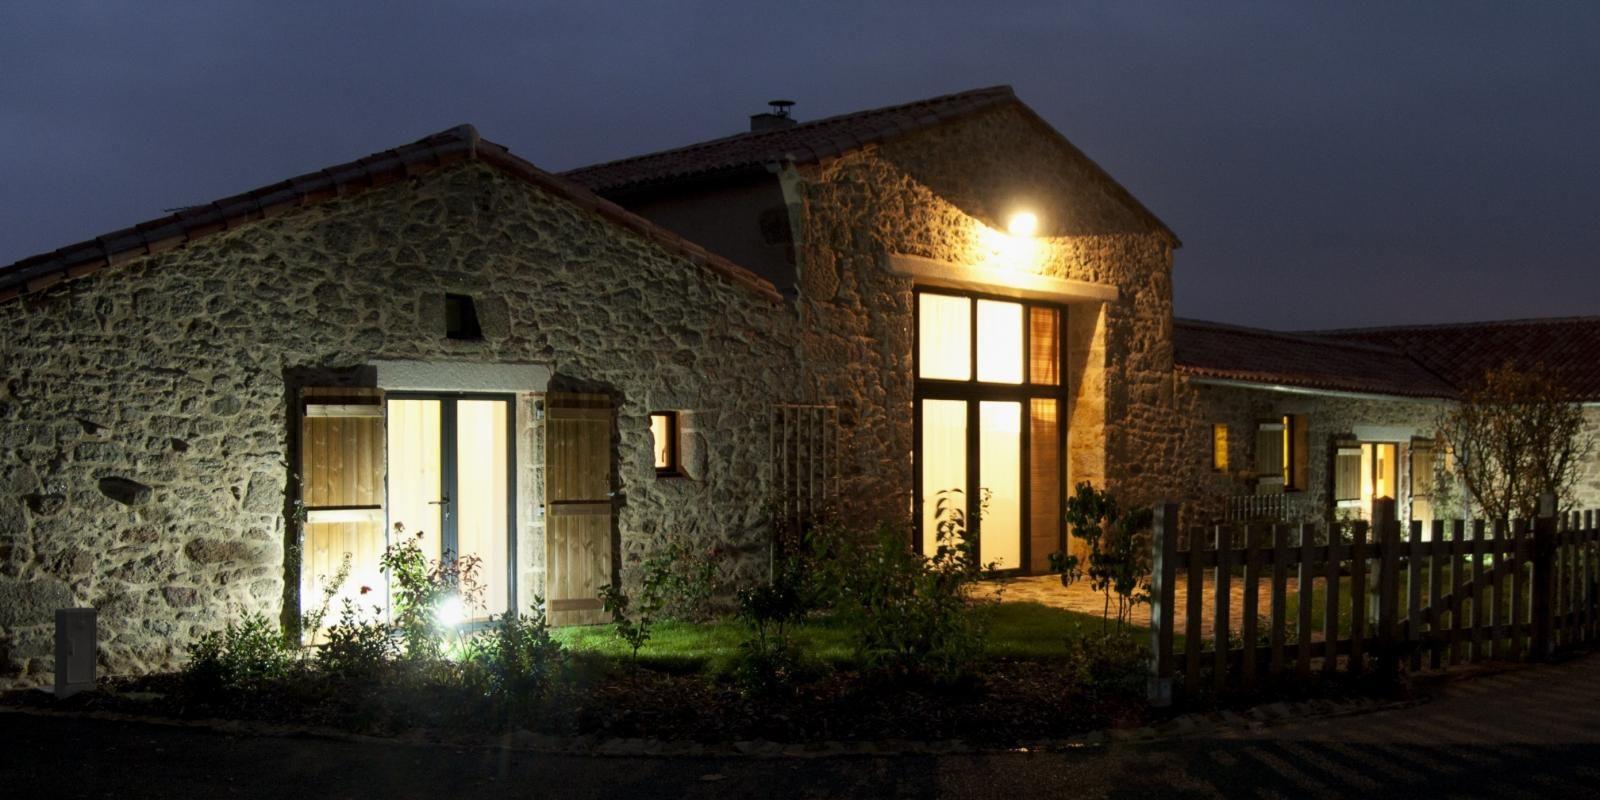 façade vue nocturne